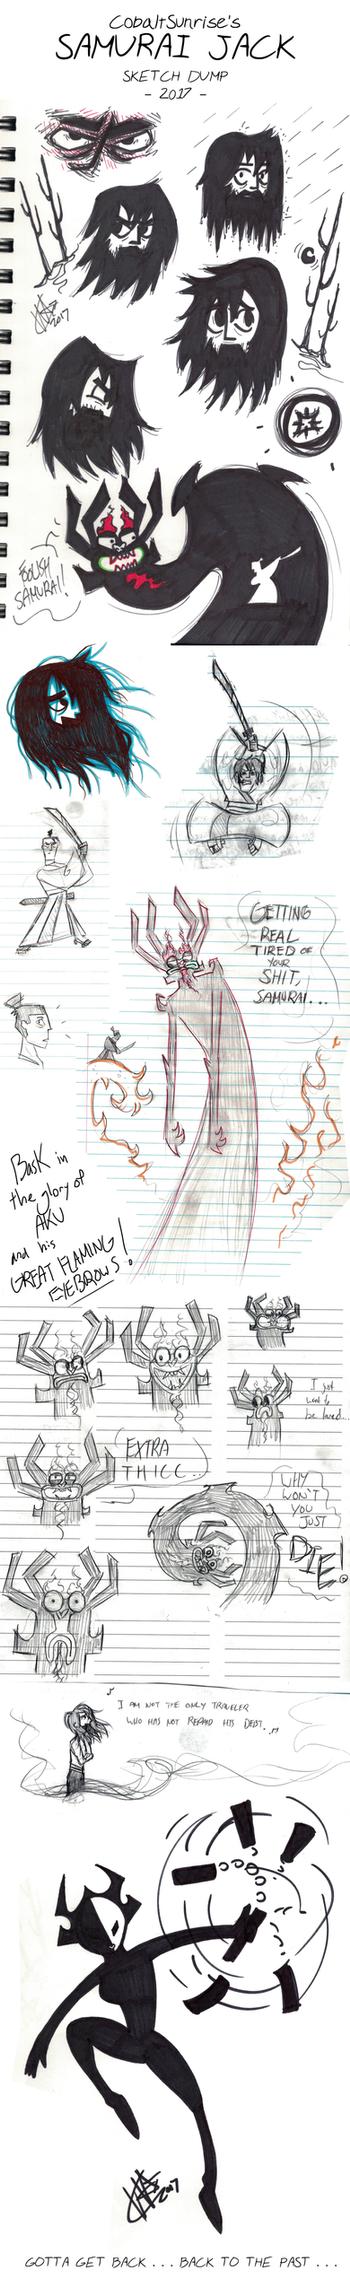 SAMURAI JACK - Sketch dump by CobaltSunrise